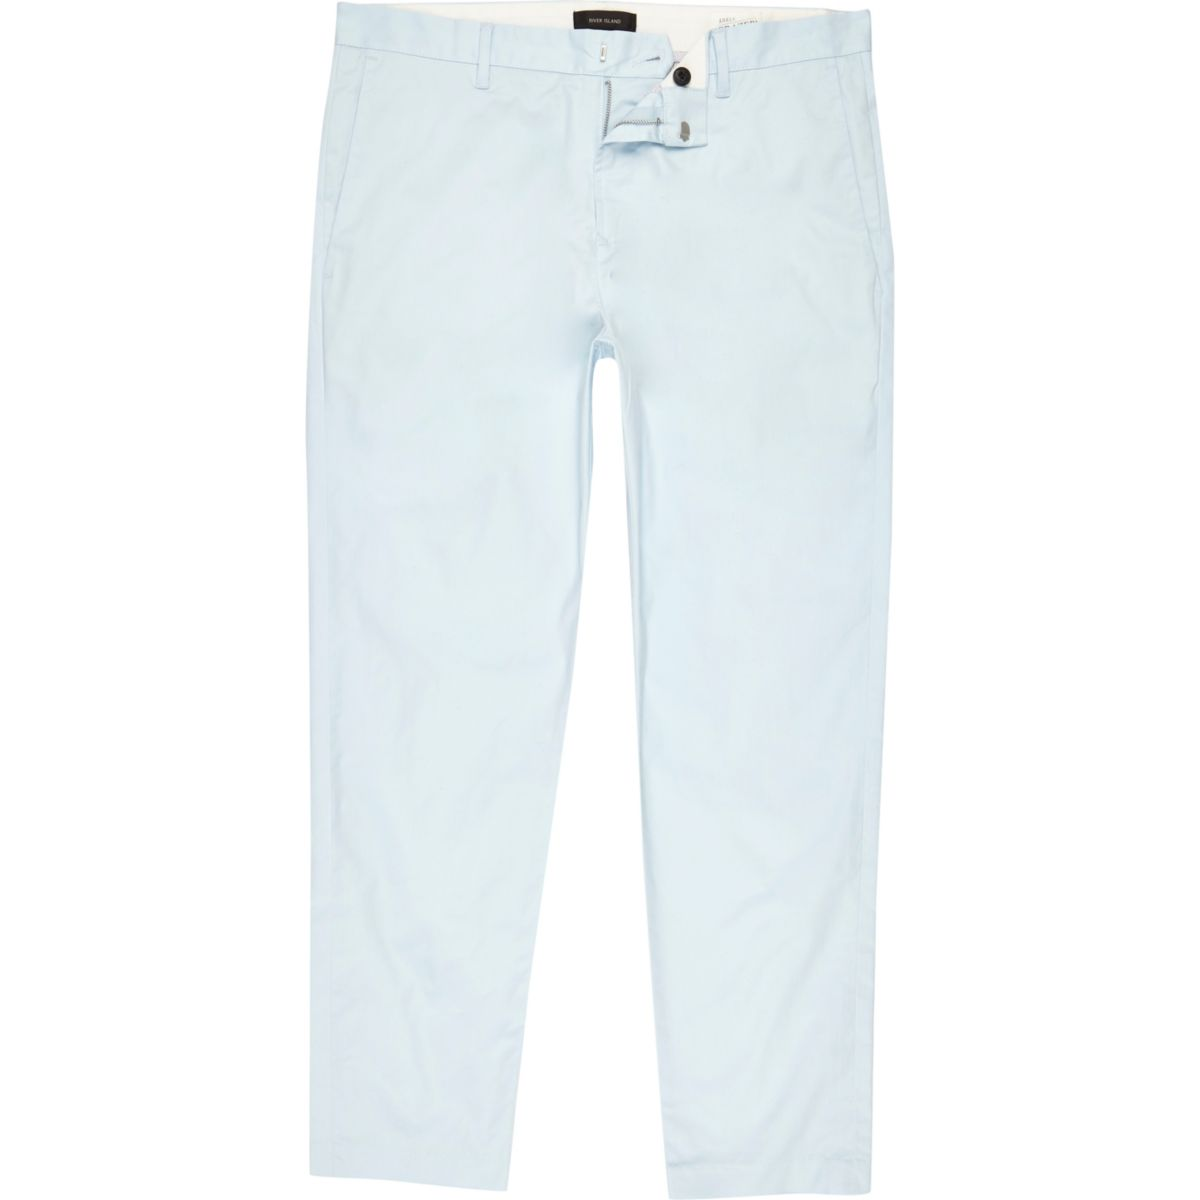 Light blue slim ankle grazer chino trousers